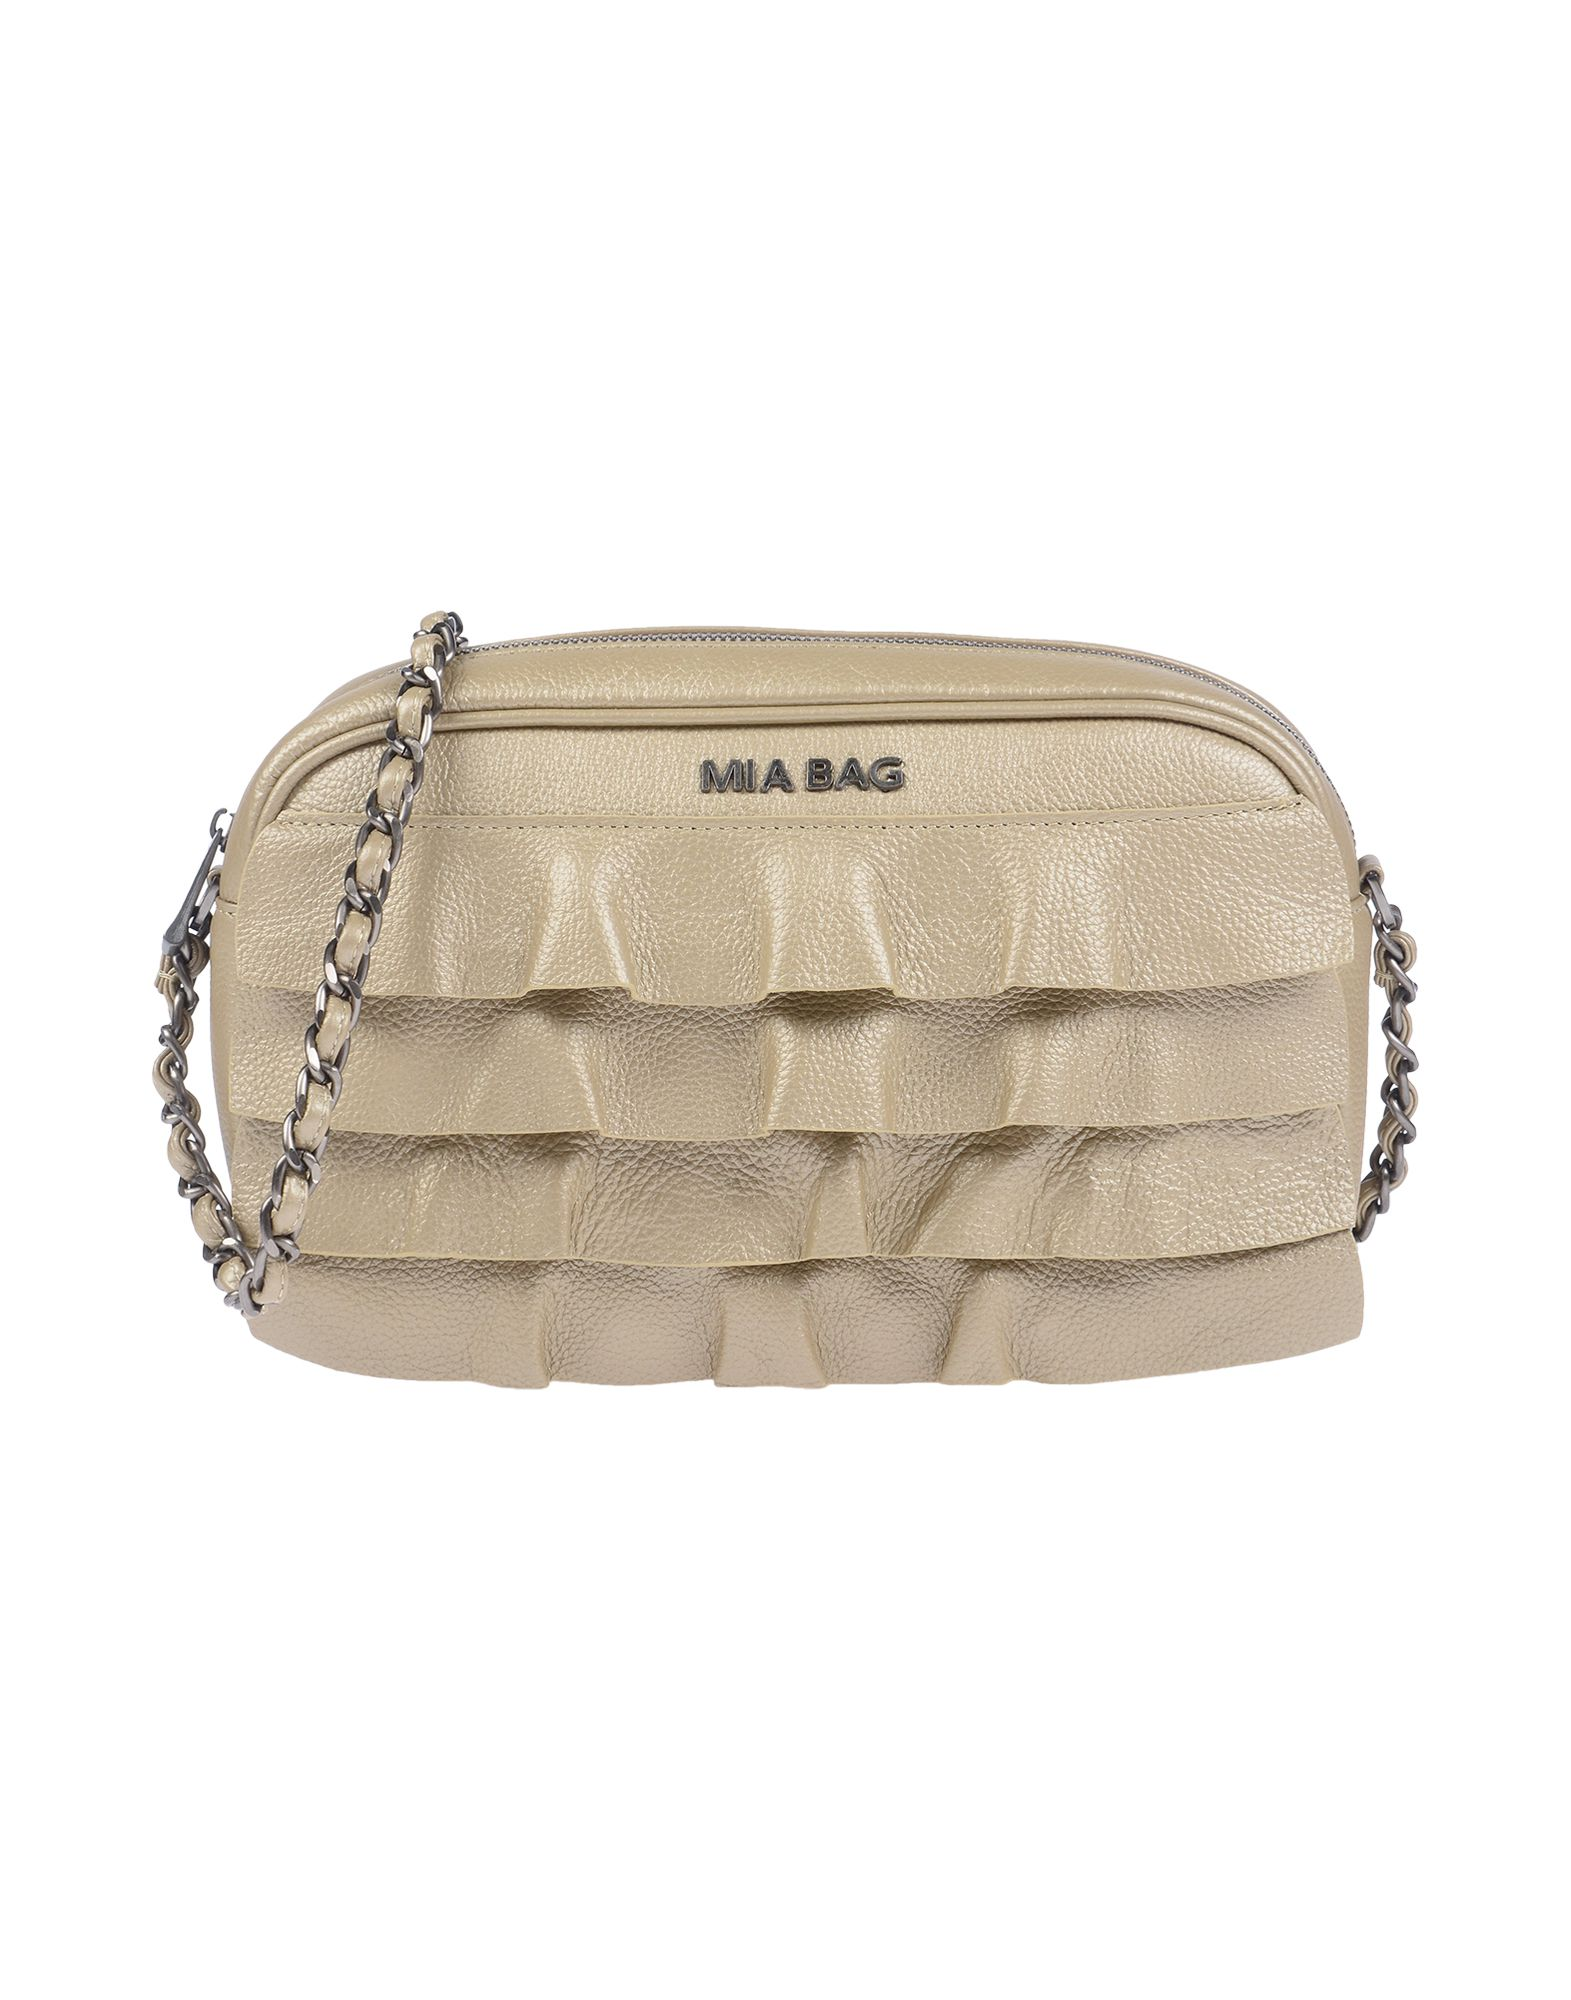 MIA BAG Сумка через плечо makeup organizer travel bag women cosmetic bags summer dumpling clutch women packages waterproof cosmetic bag handbag